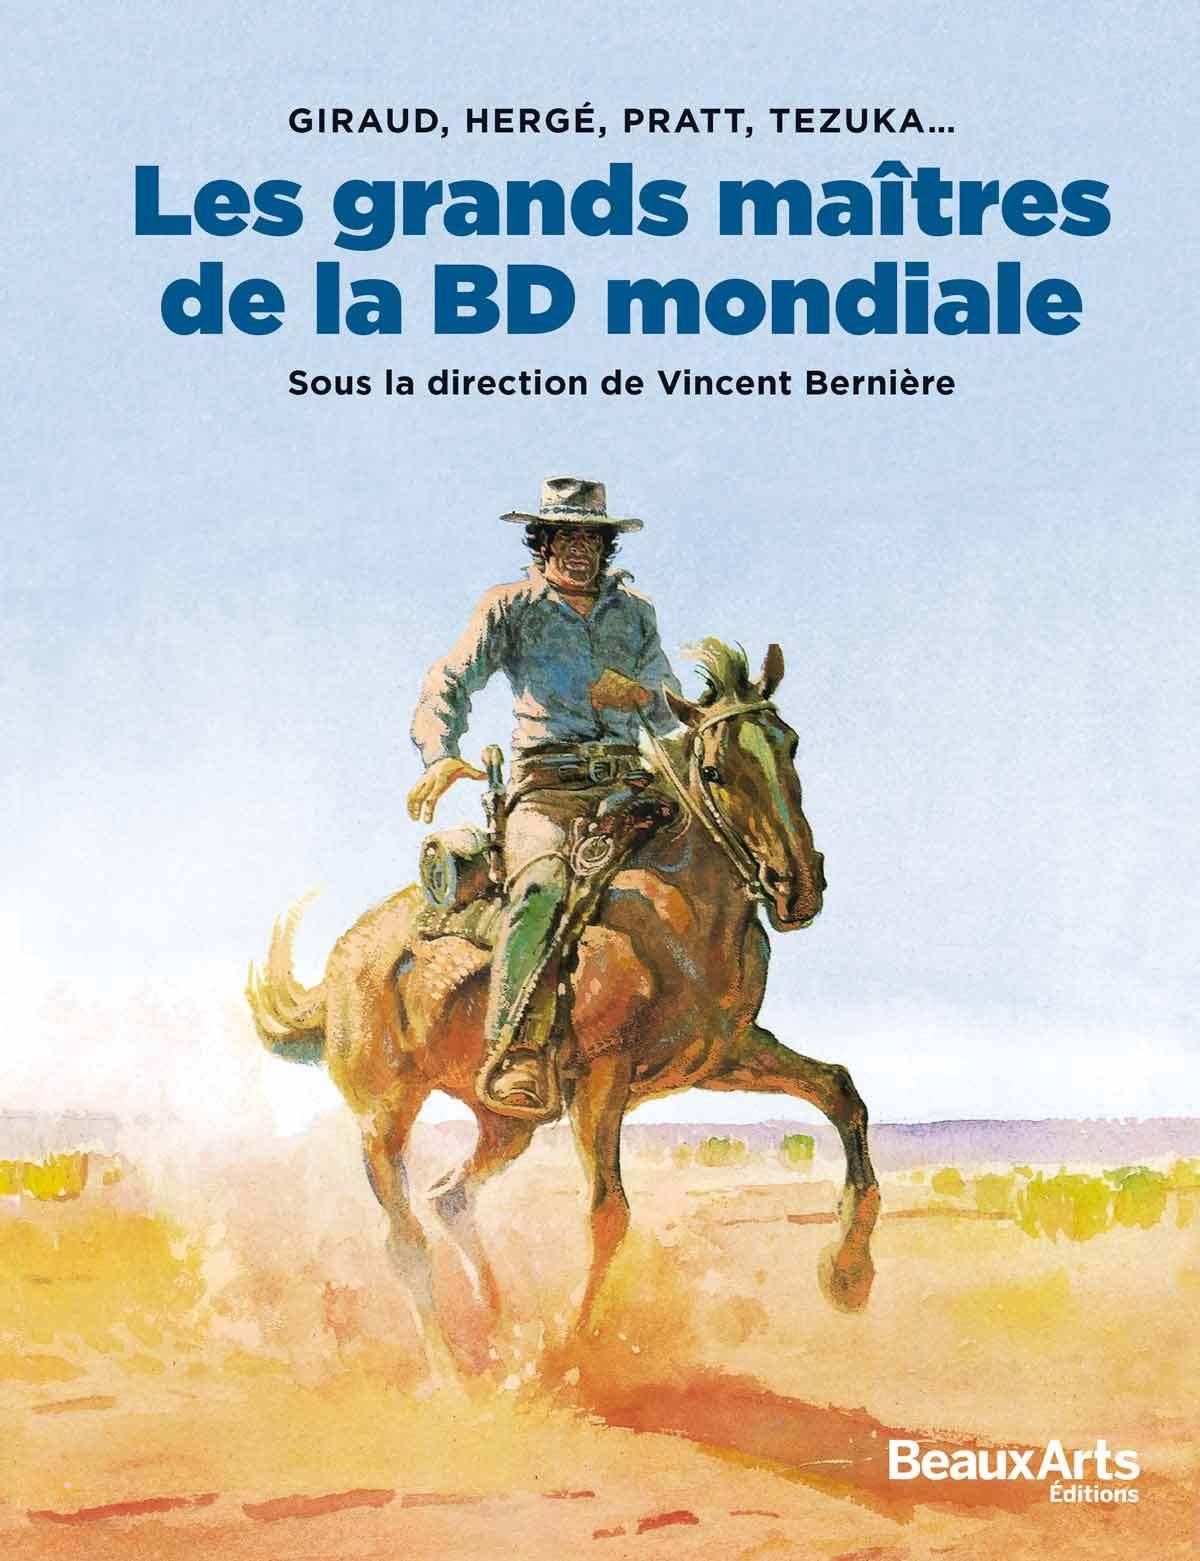 LES GRANDS MAITRES DE LA BD MONDIALE - GIRAUD,HERGE,PRATT,TEZUKA...